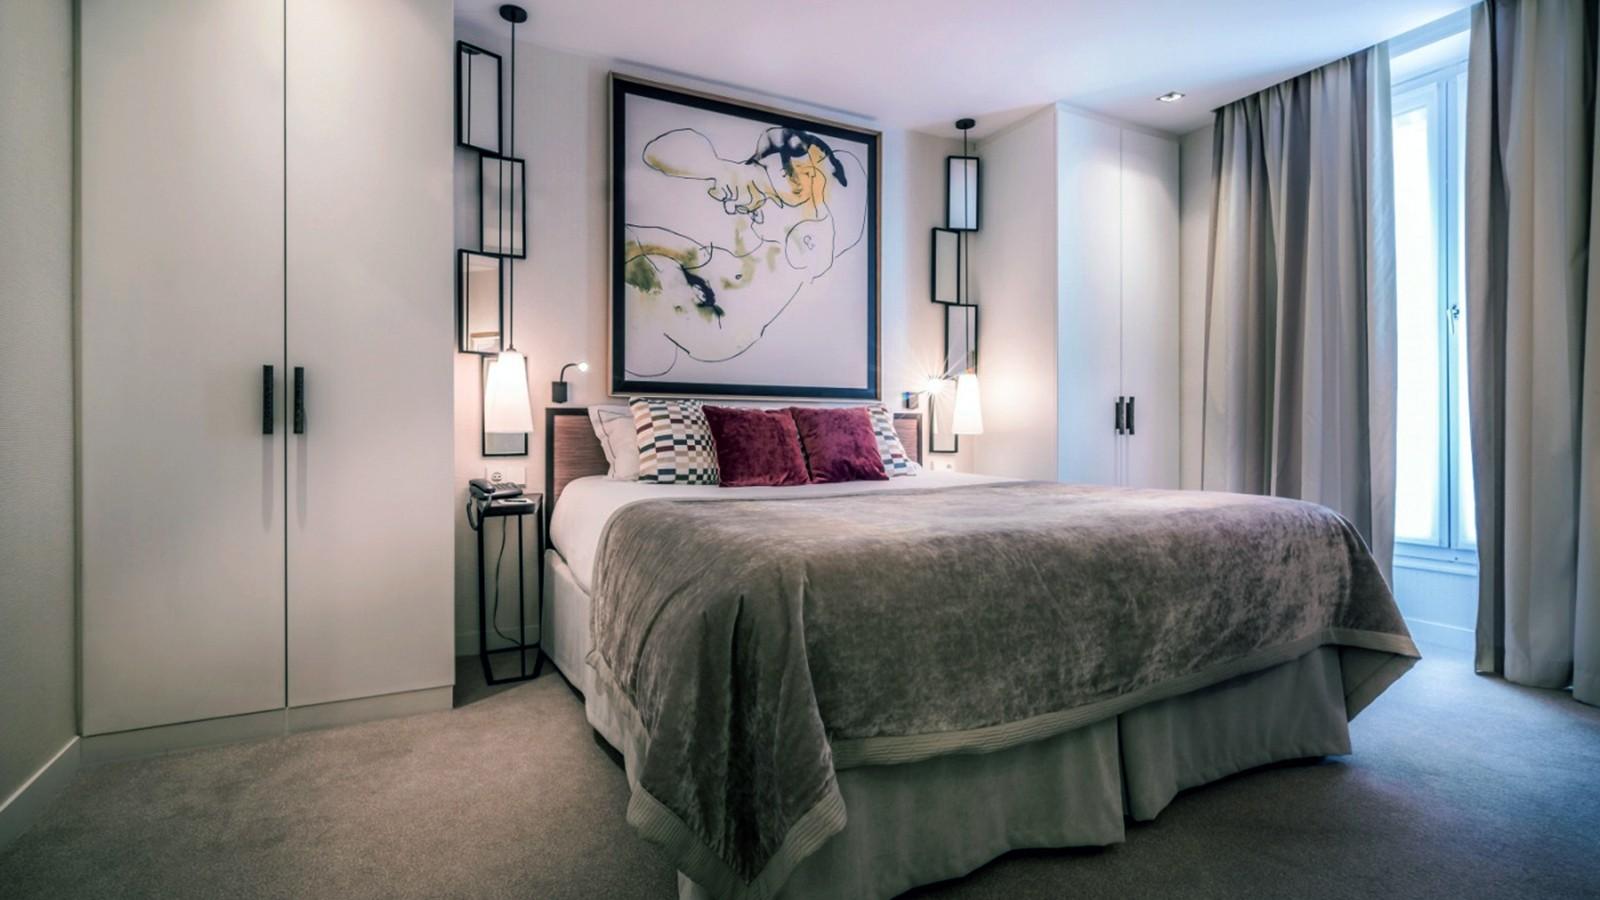 EFI Design Hotel Balmoral Paris Efi Design (10) 1180